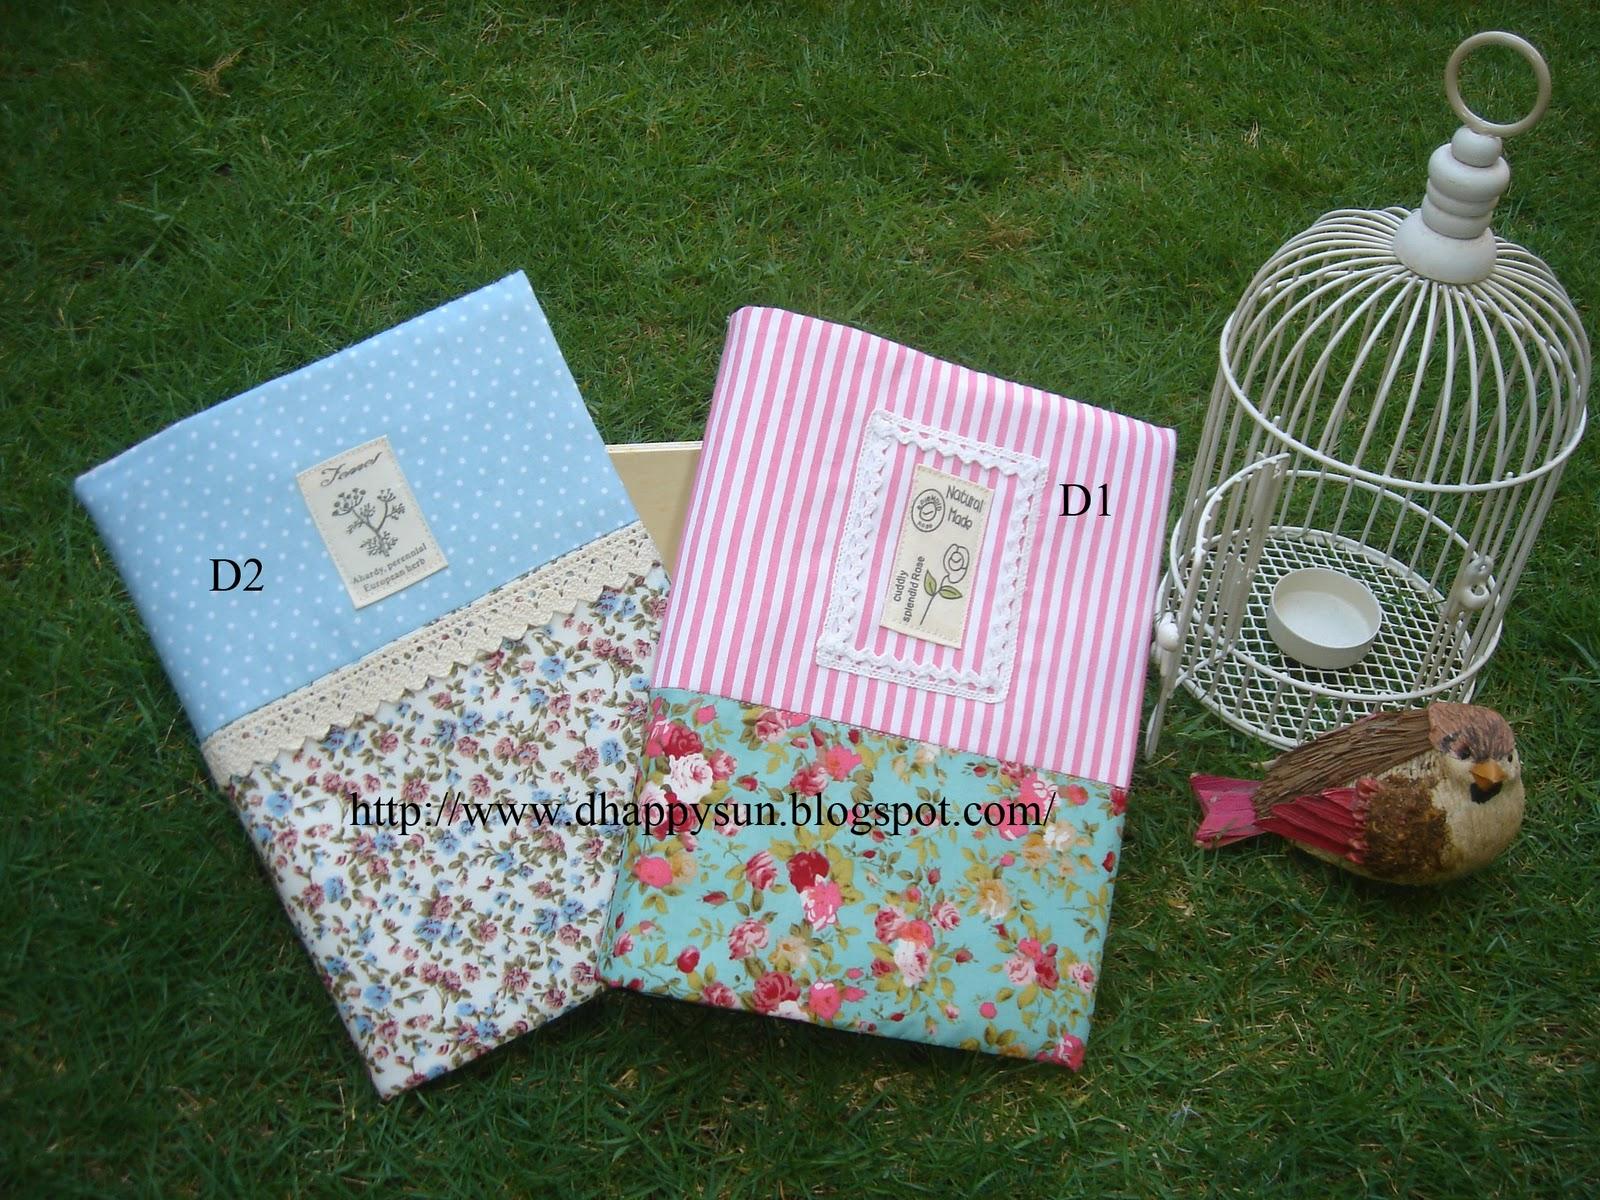 Book Cover Material Key : Handmade fabric book cover